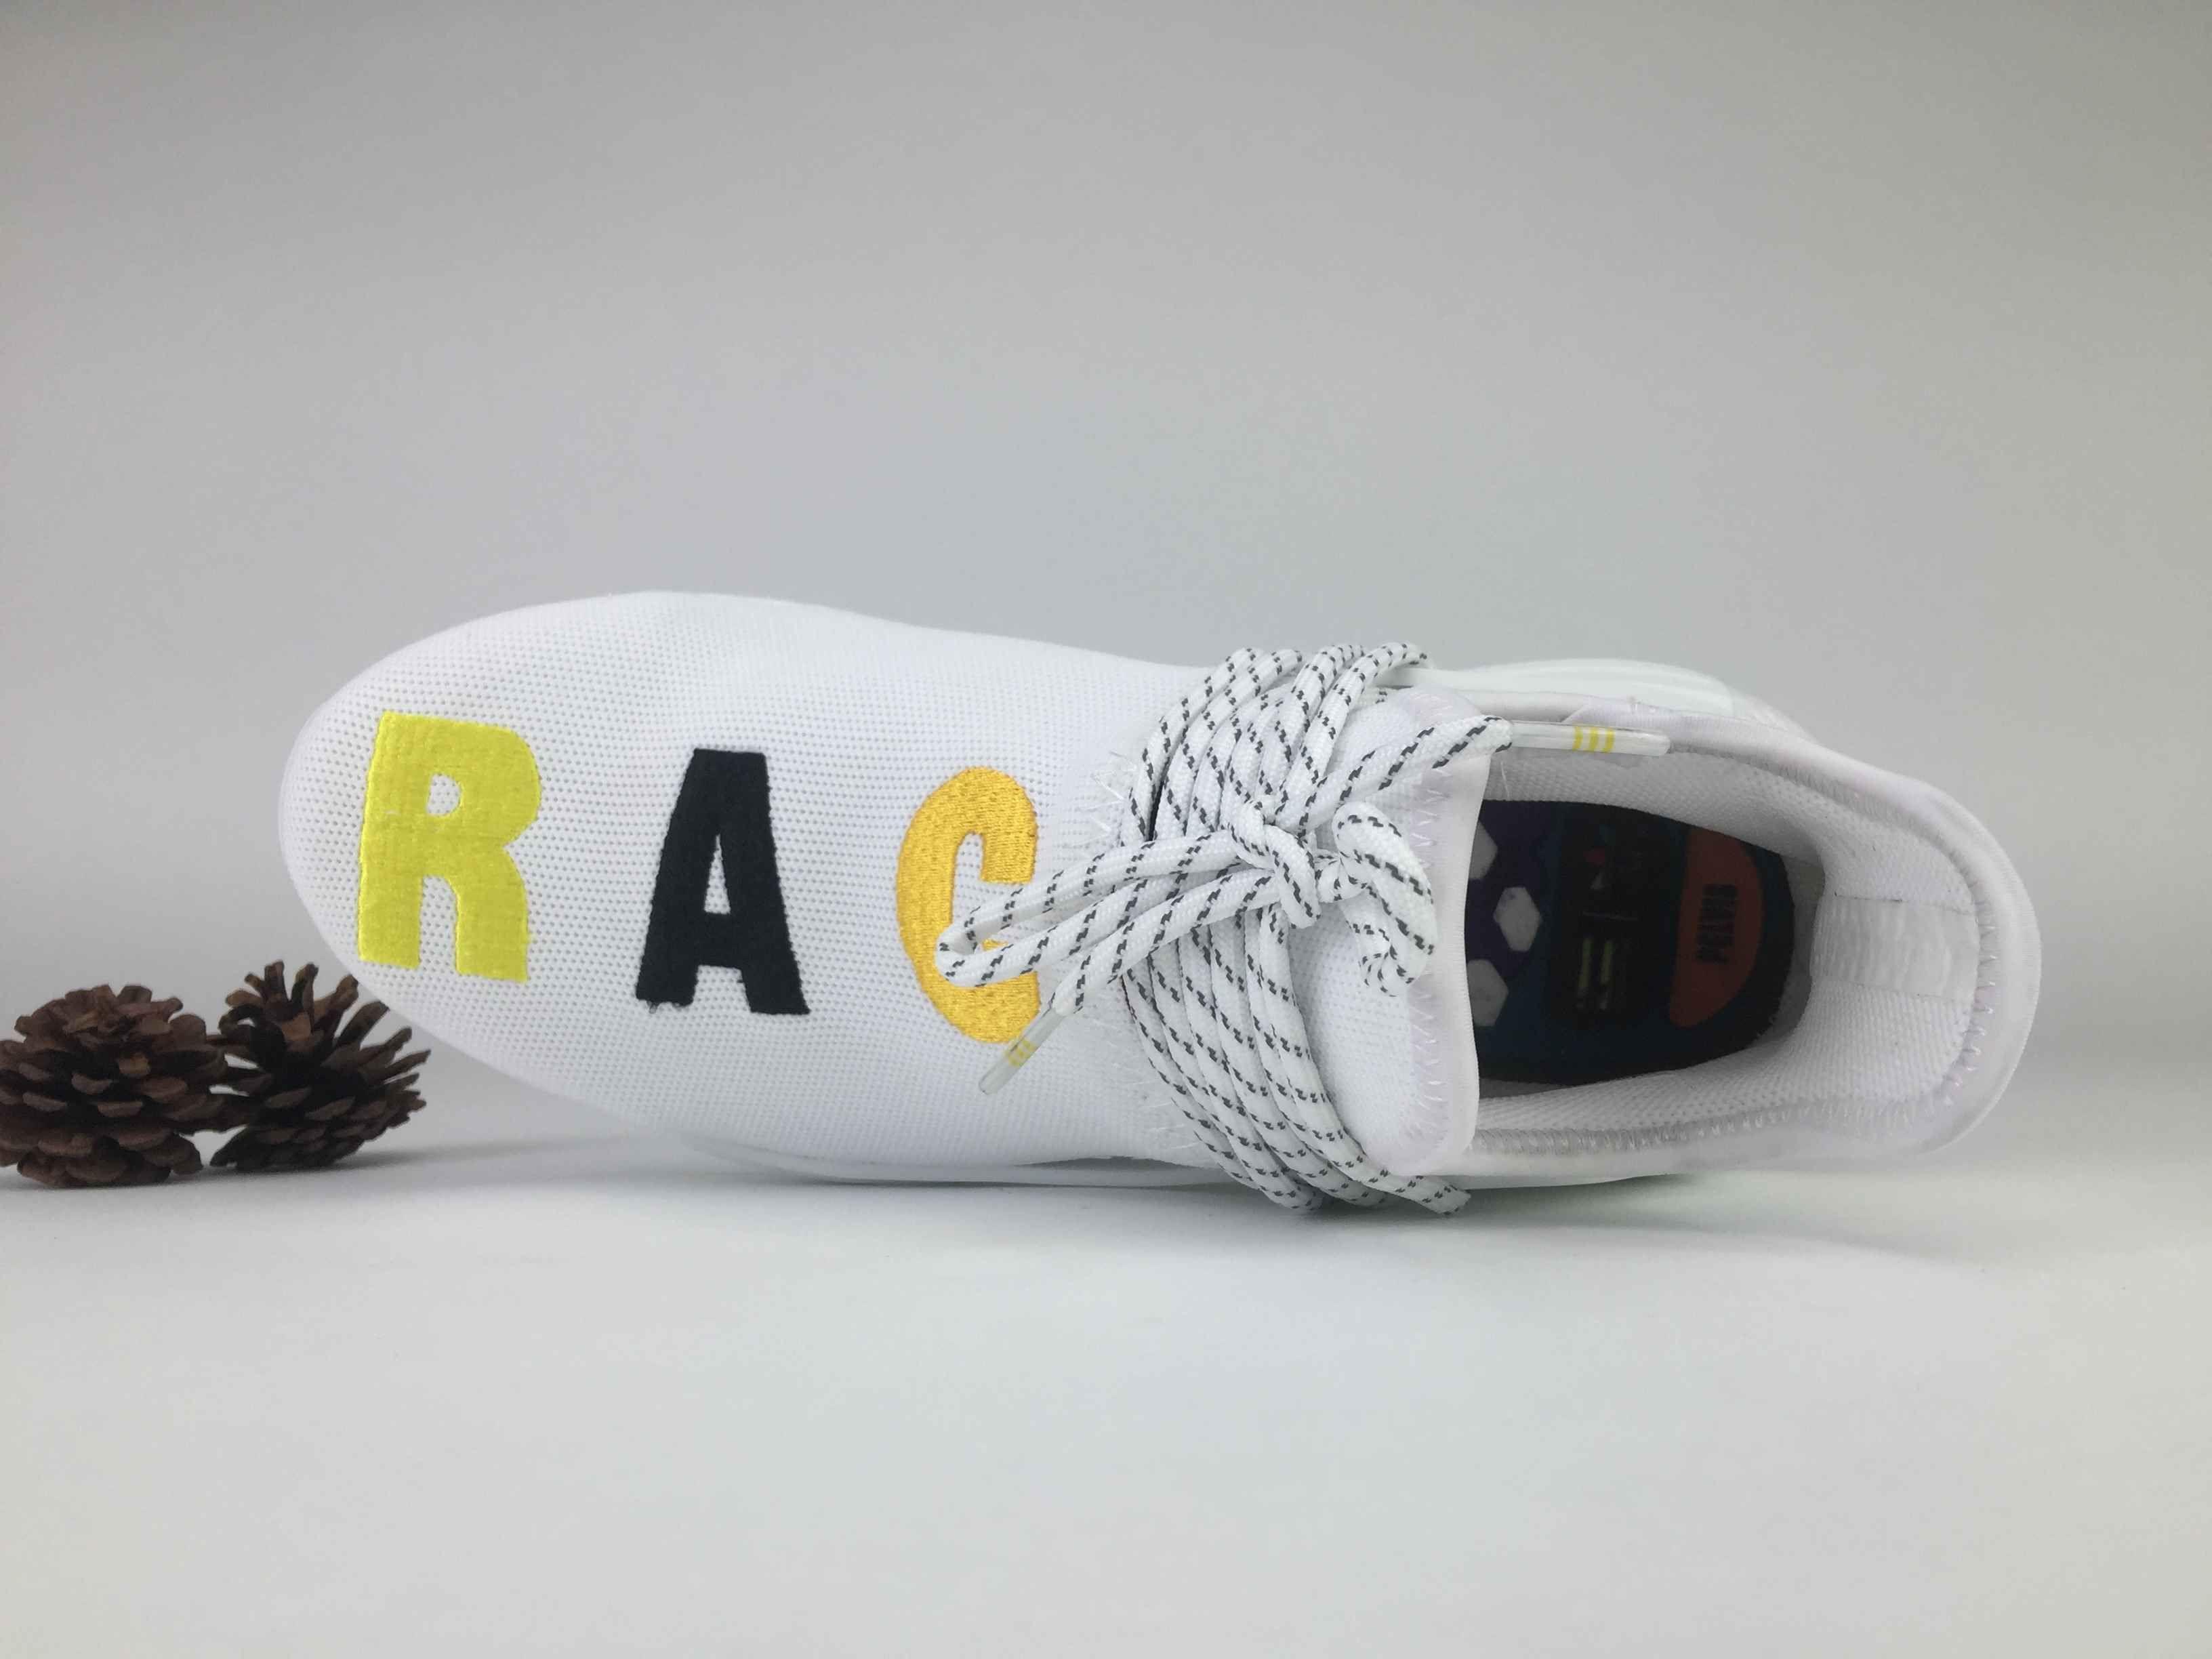 110122c82 Adidas NMD Pharrell Williams Human Race Birthday Real Boost for Sale  36-48